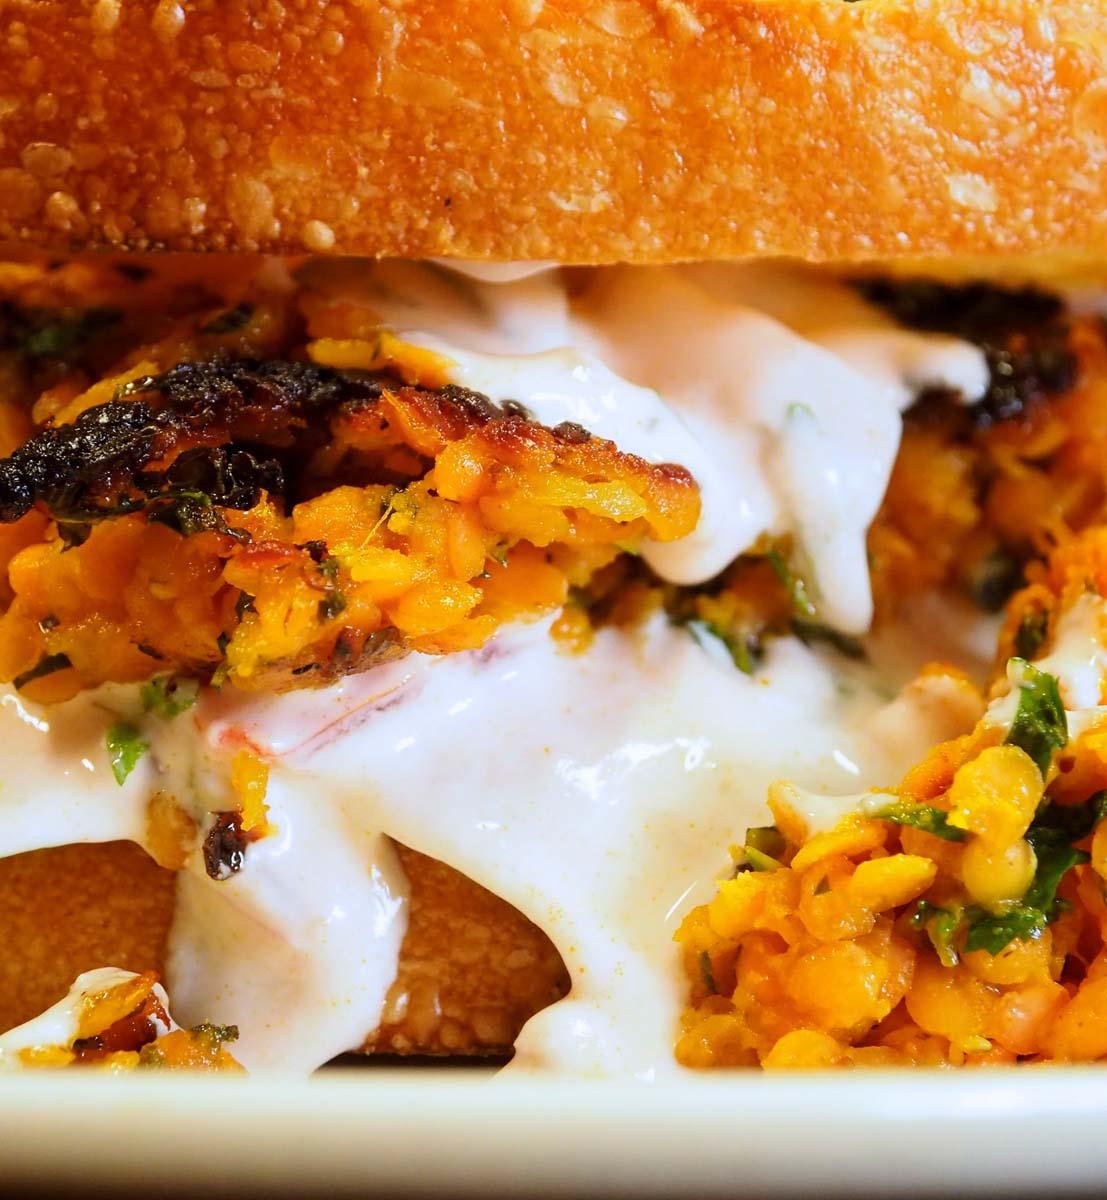 burger-king_14370949998_o.jpg